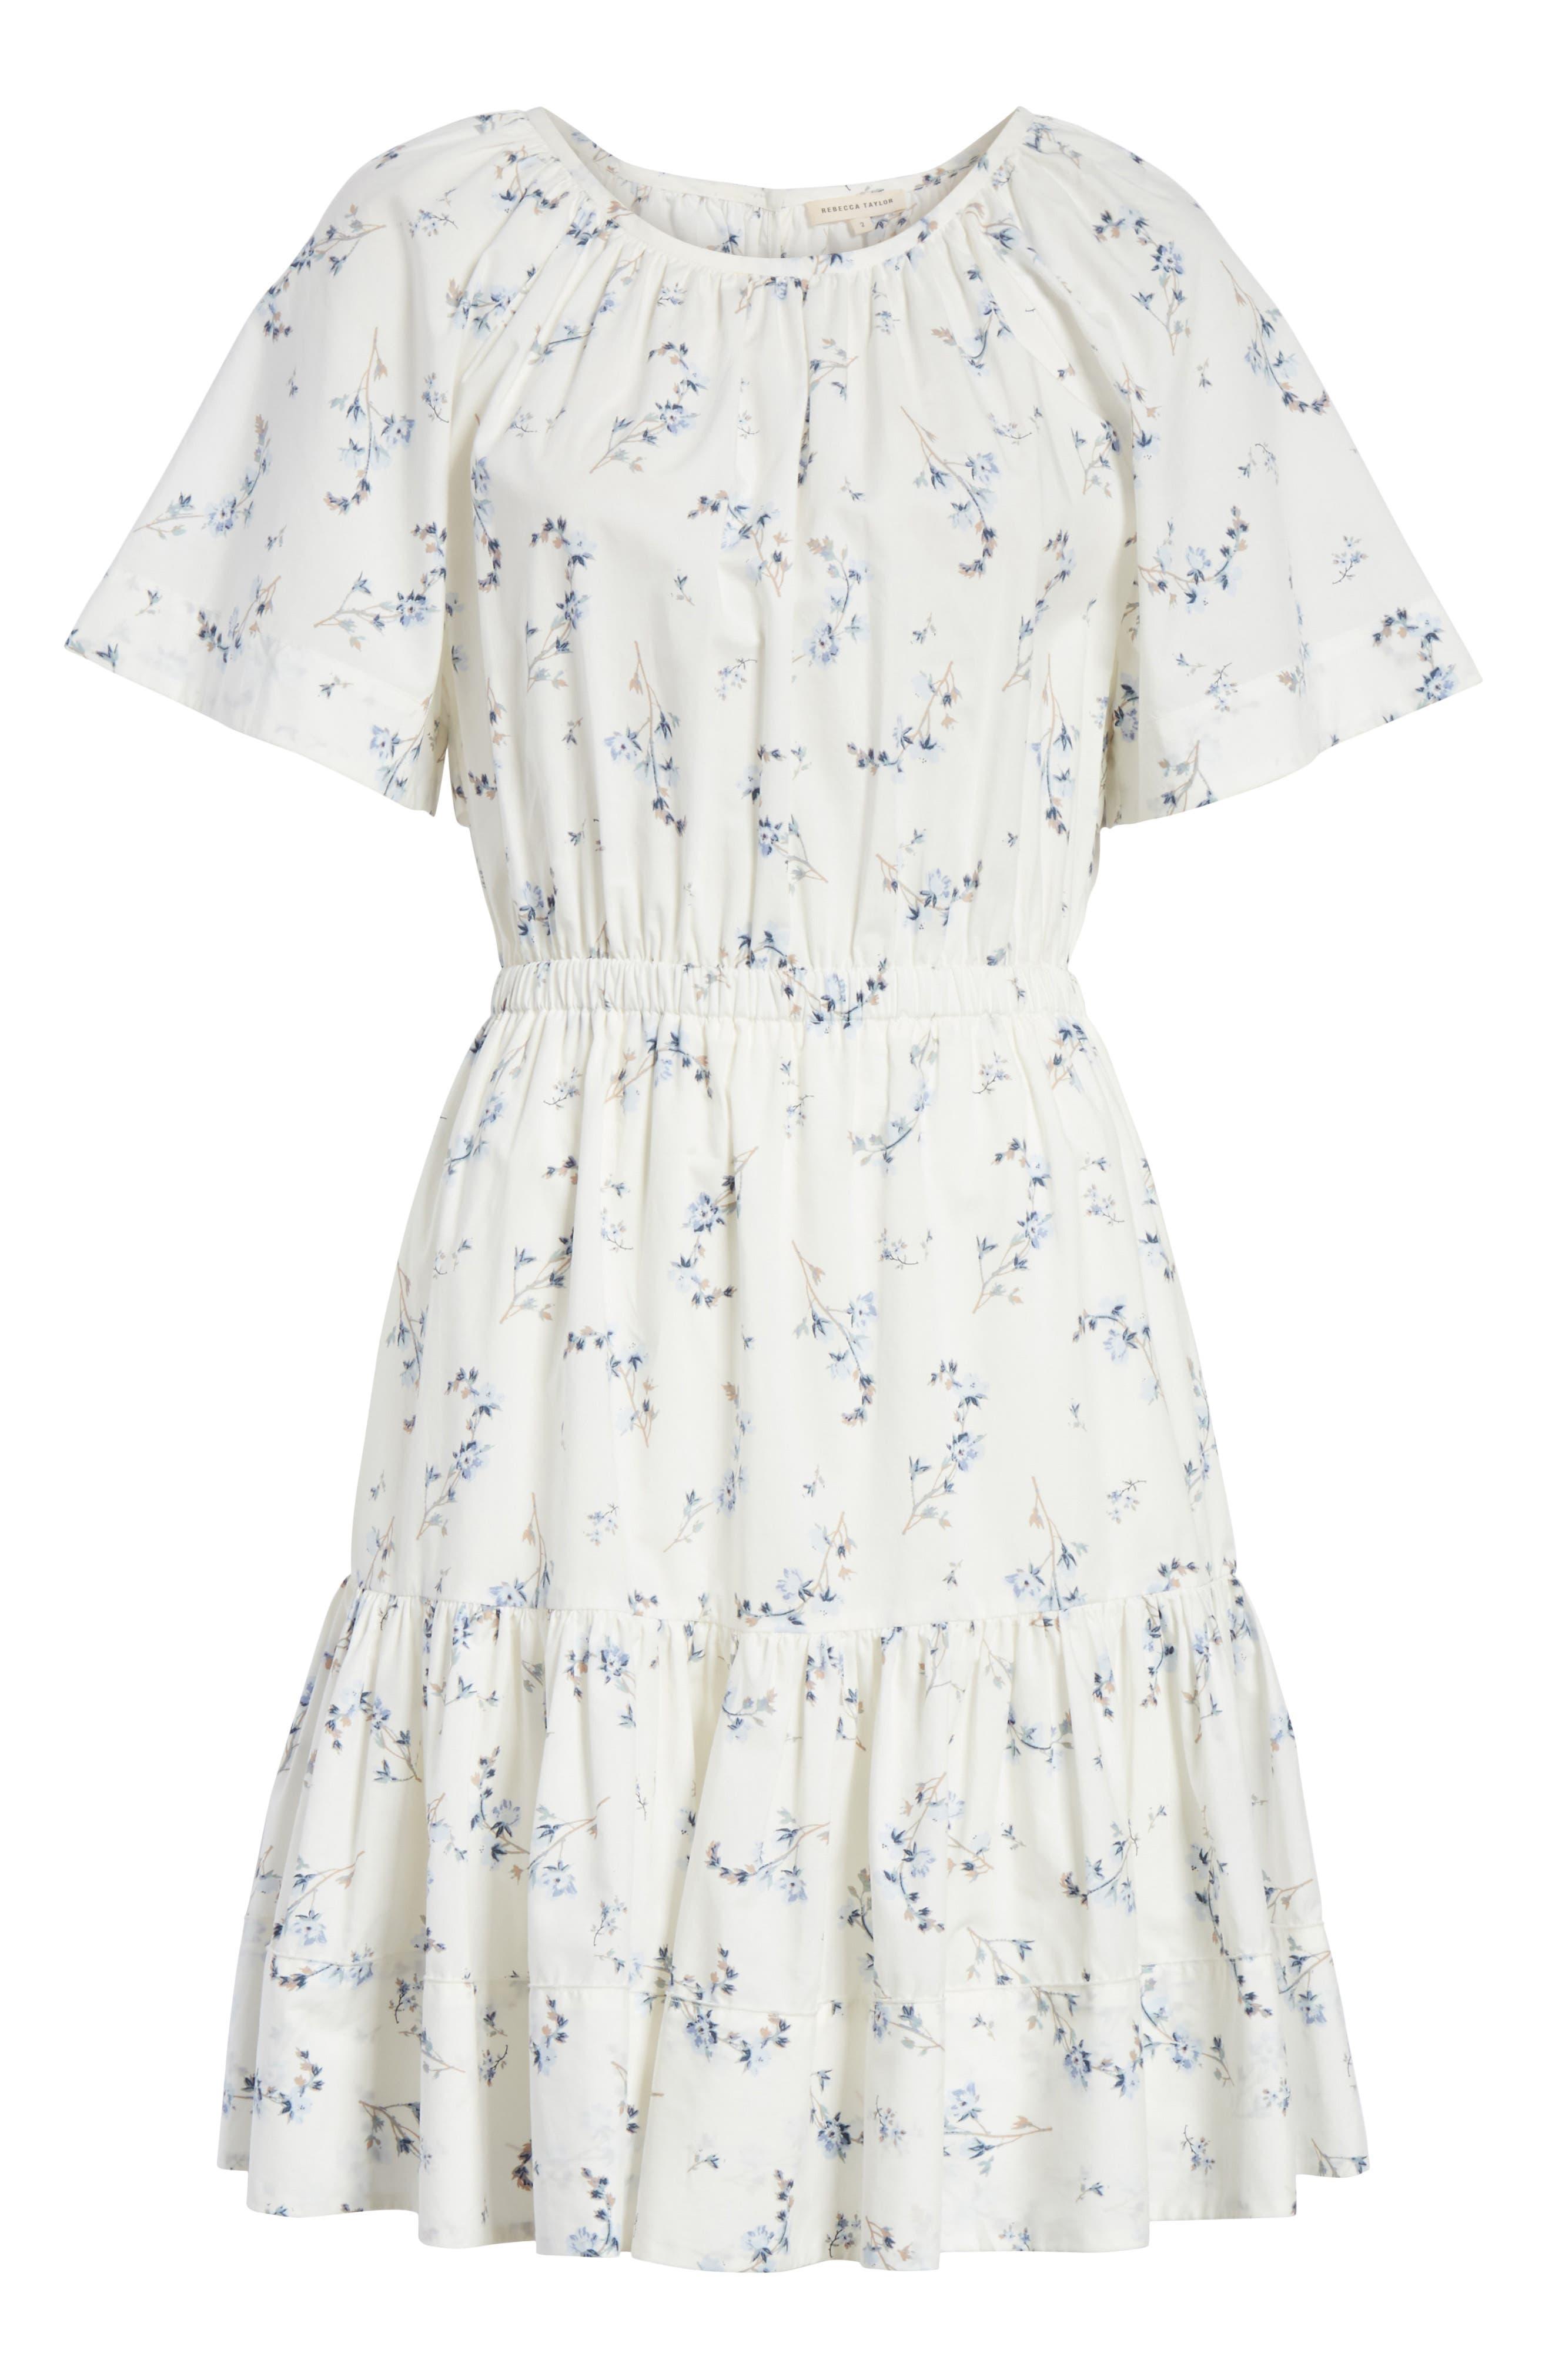 Francine Back Cutout Mini Dress,                             Alternate thumbnail 6, color,                             103